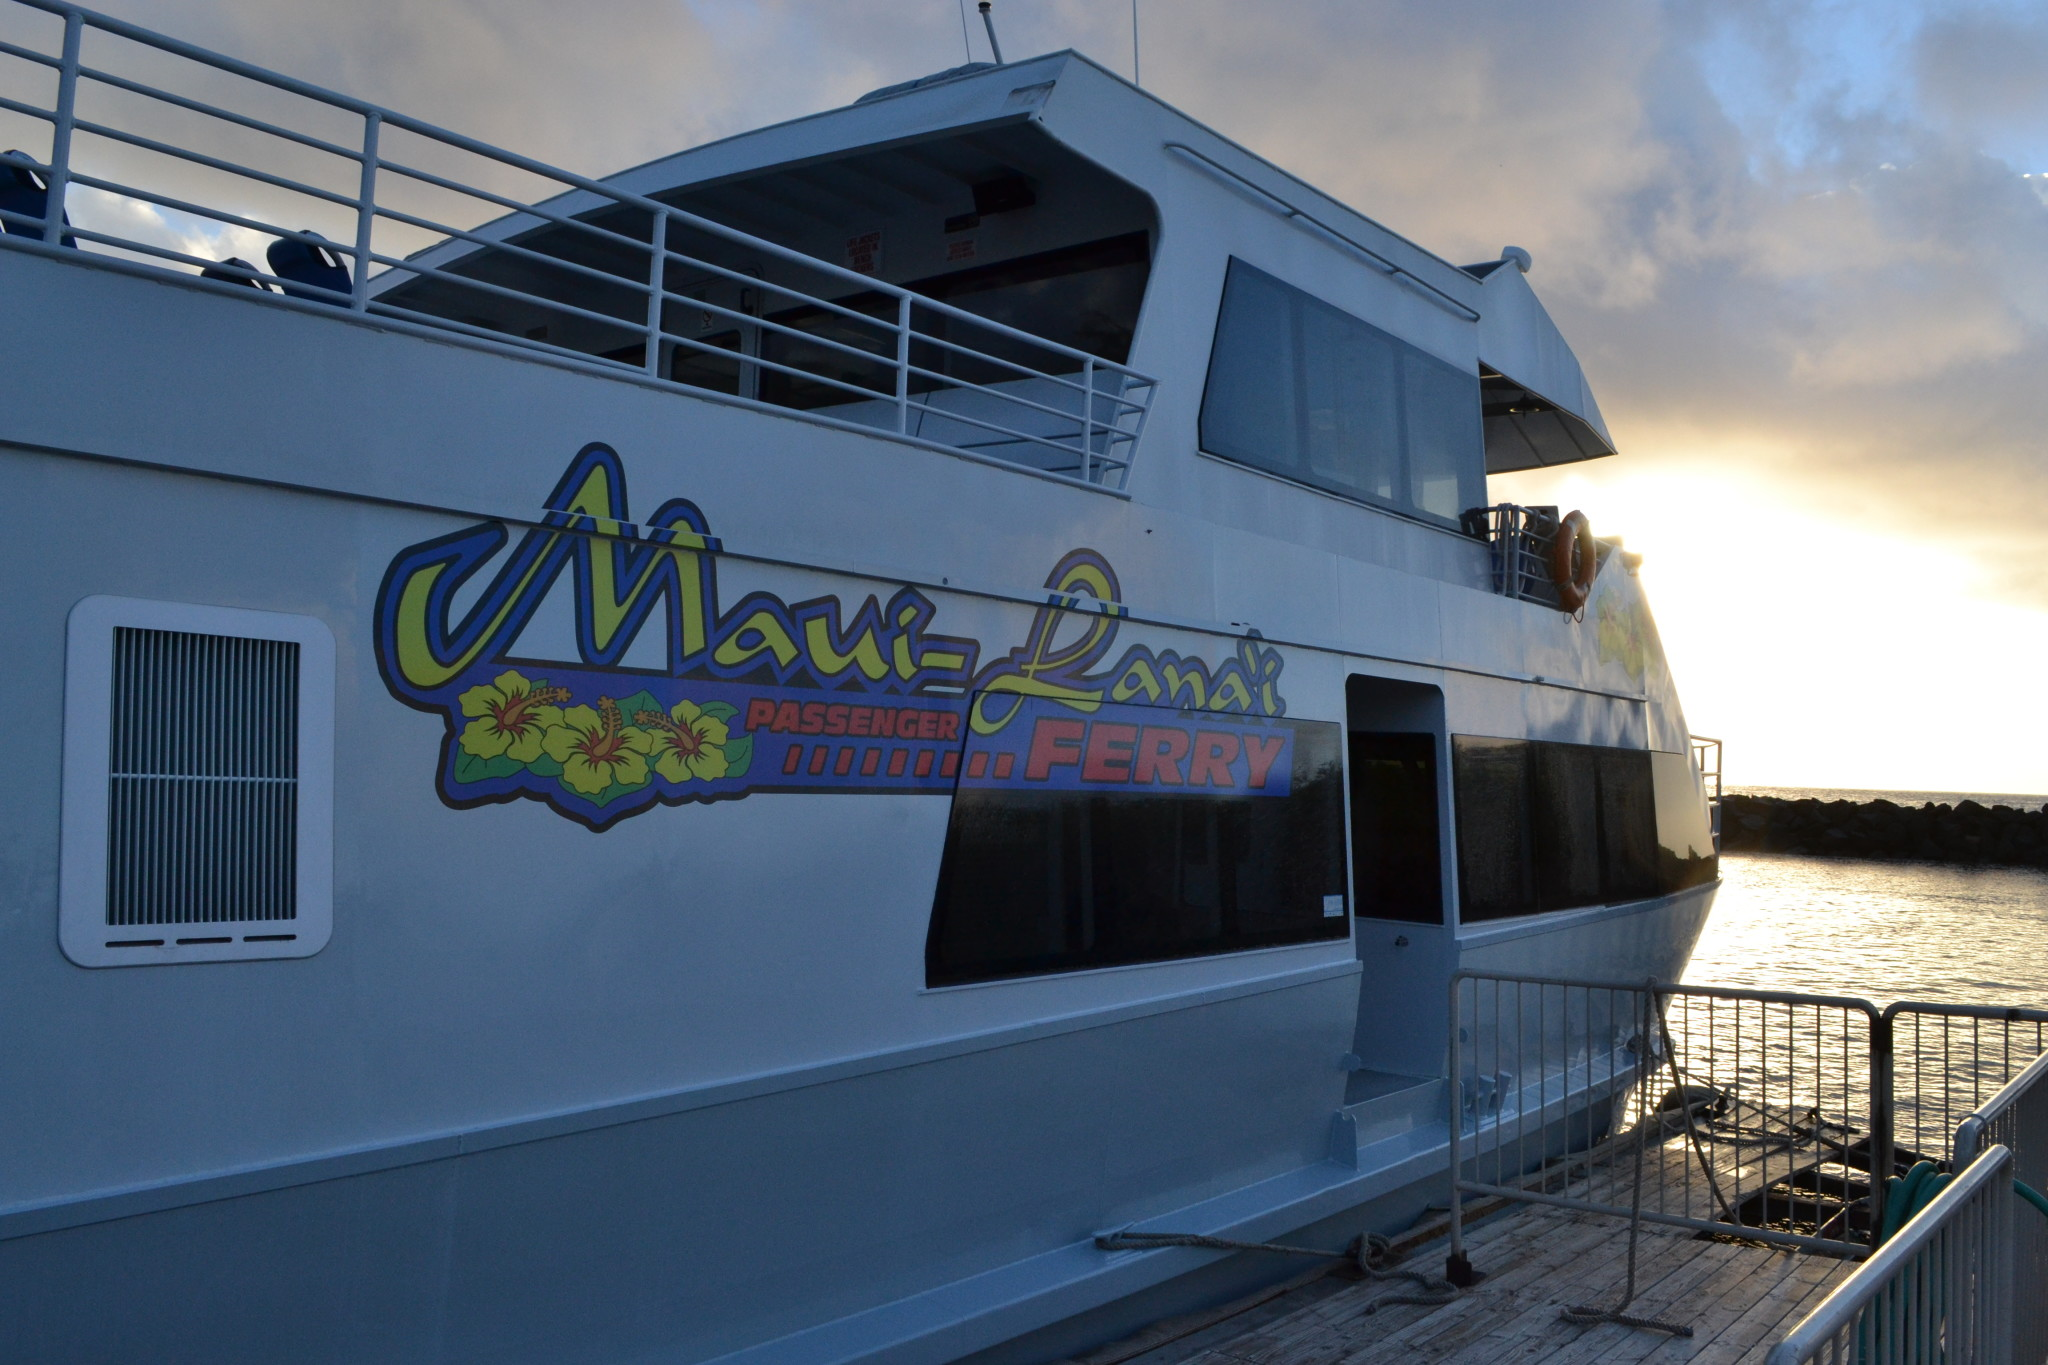 lanai-ferry-from-maui-hawaii